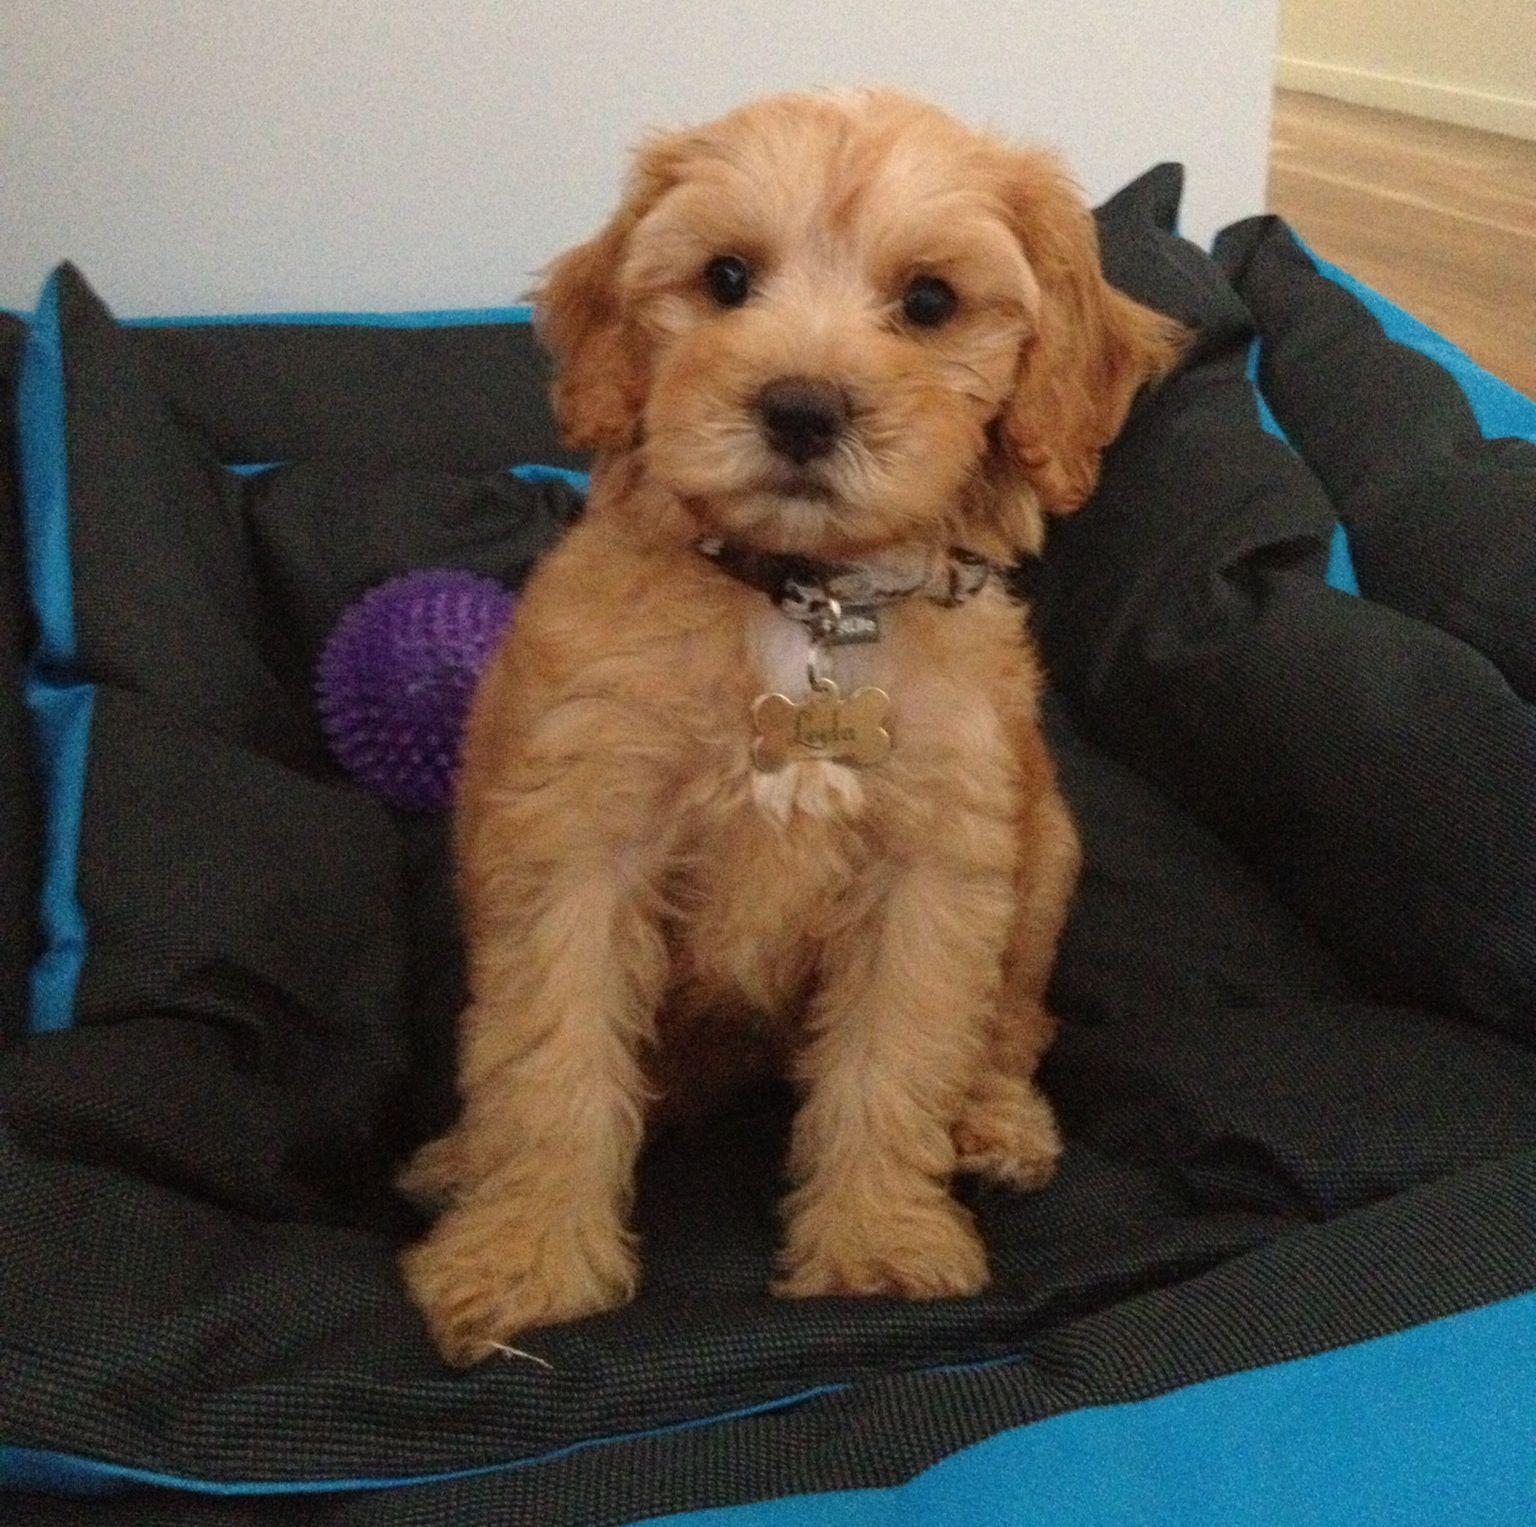 Tamaruke Daria (Leela) our 9 week old Australian